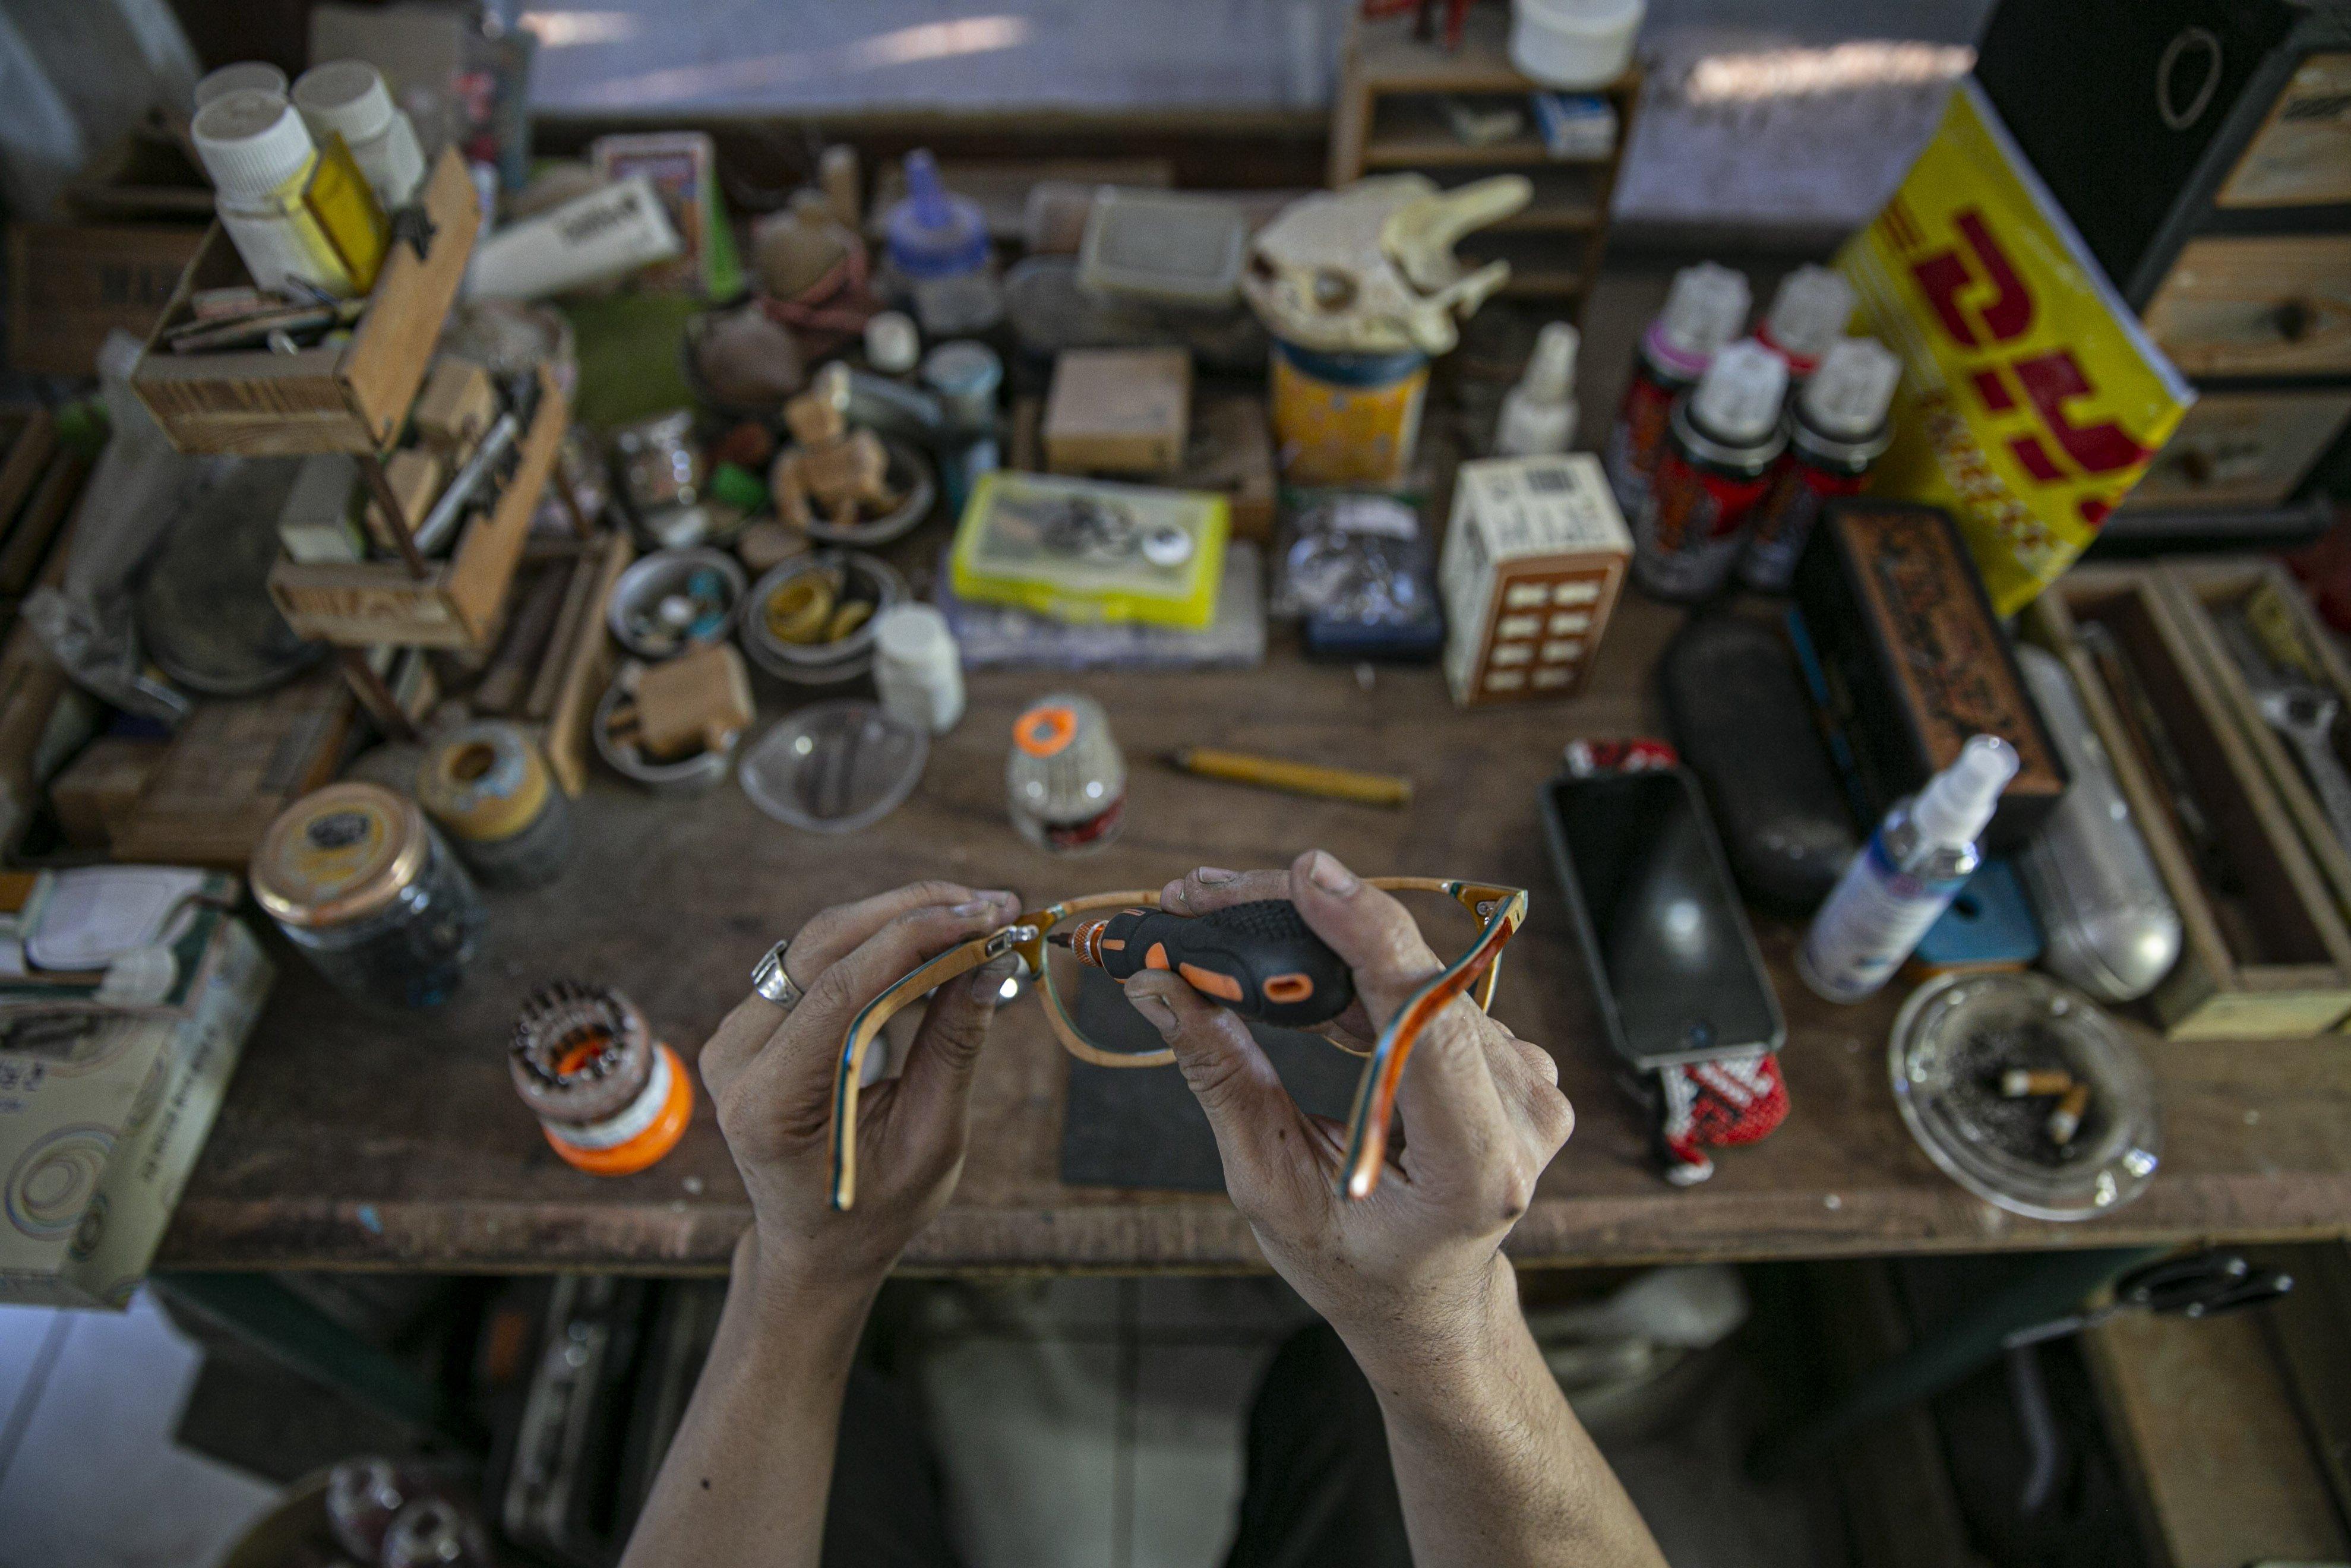 Bonny Andrew (34) memperlihatkan kacamata kayu di workshopnya di kawasan Kramat Jati, Jakarta Timur, Kamis (1/10/2020). Dibuat dari limbah papan skate, produk kacamata tersebut dibandrol dengan harga mulai dari Rp. 1.200.000 hingga Rp. 1.500.000. Tidak hanya menyasar pasar lokal produk kacamata kabau juga sudah merambah ke pasar mancanegara seperti Australia, Amerika, Swiss, dan Jepang.